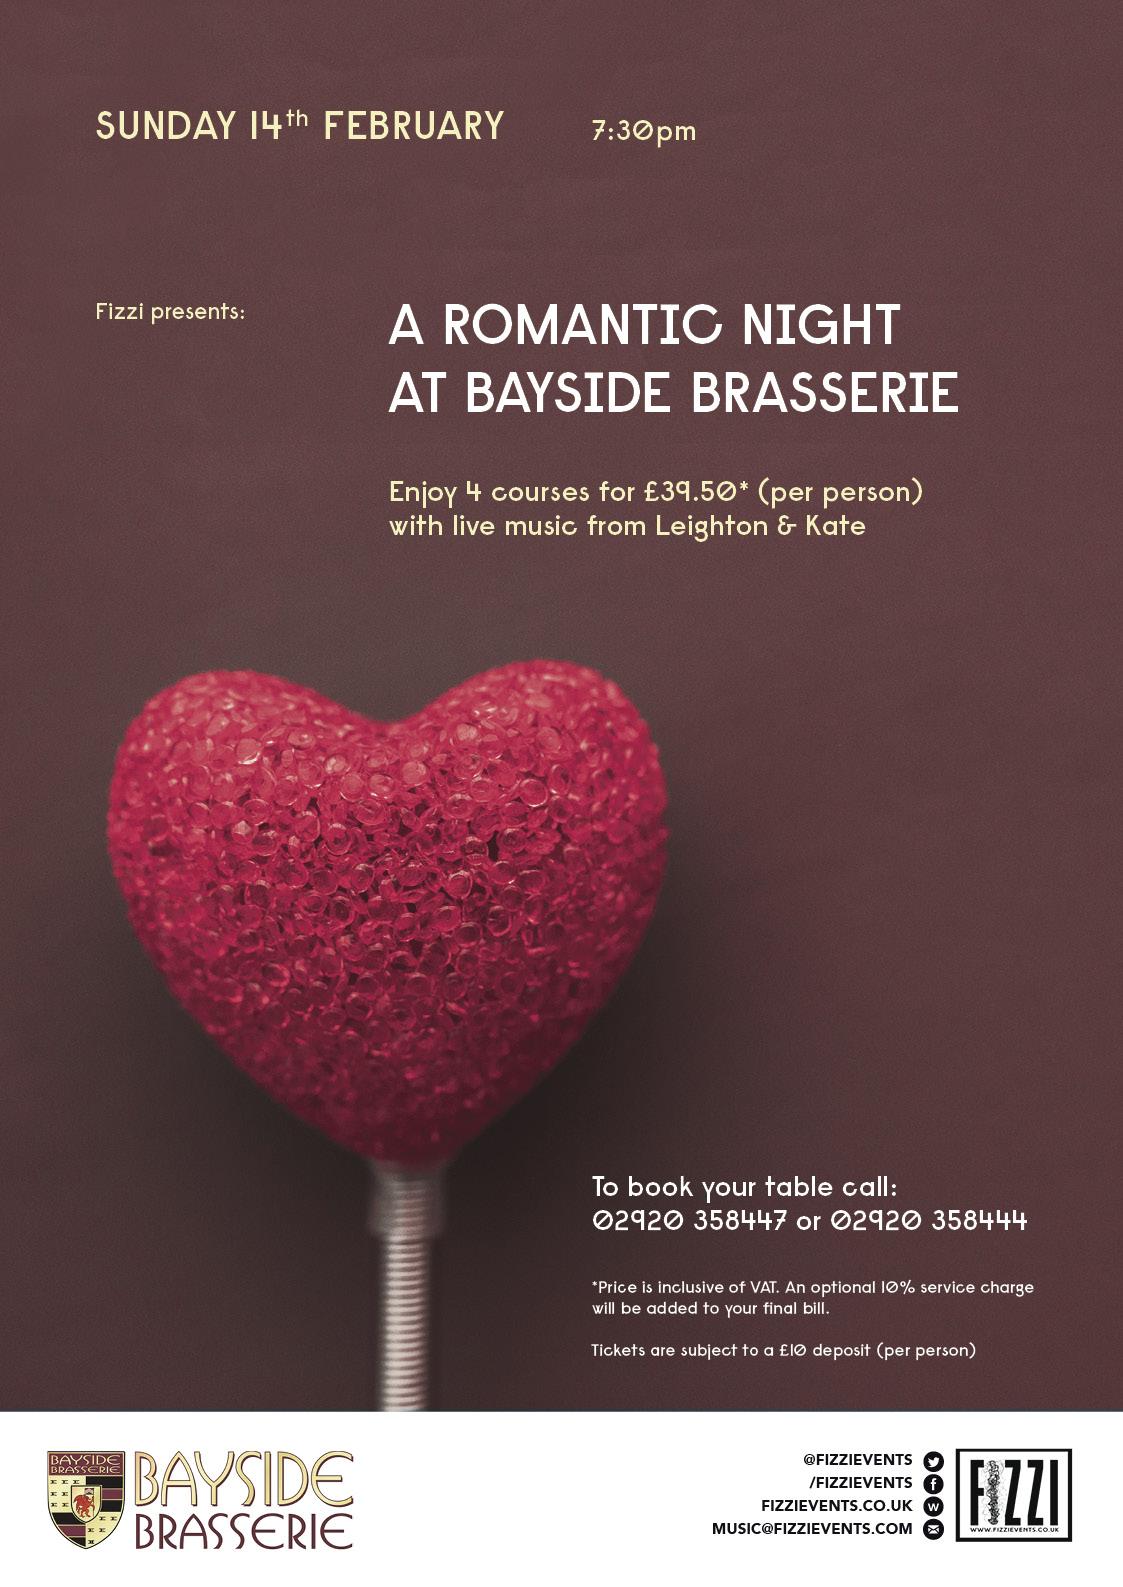 Bayside Brasserie: Valentines Night